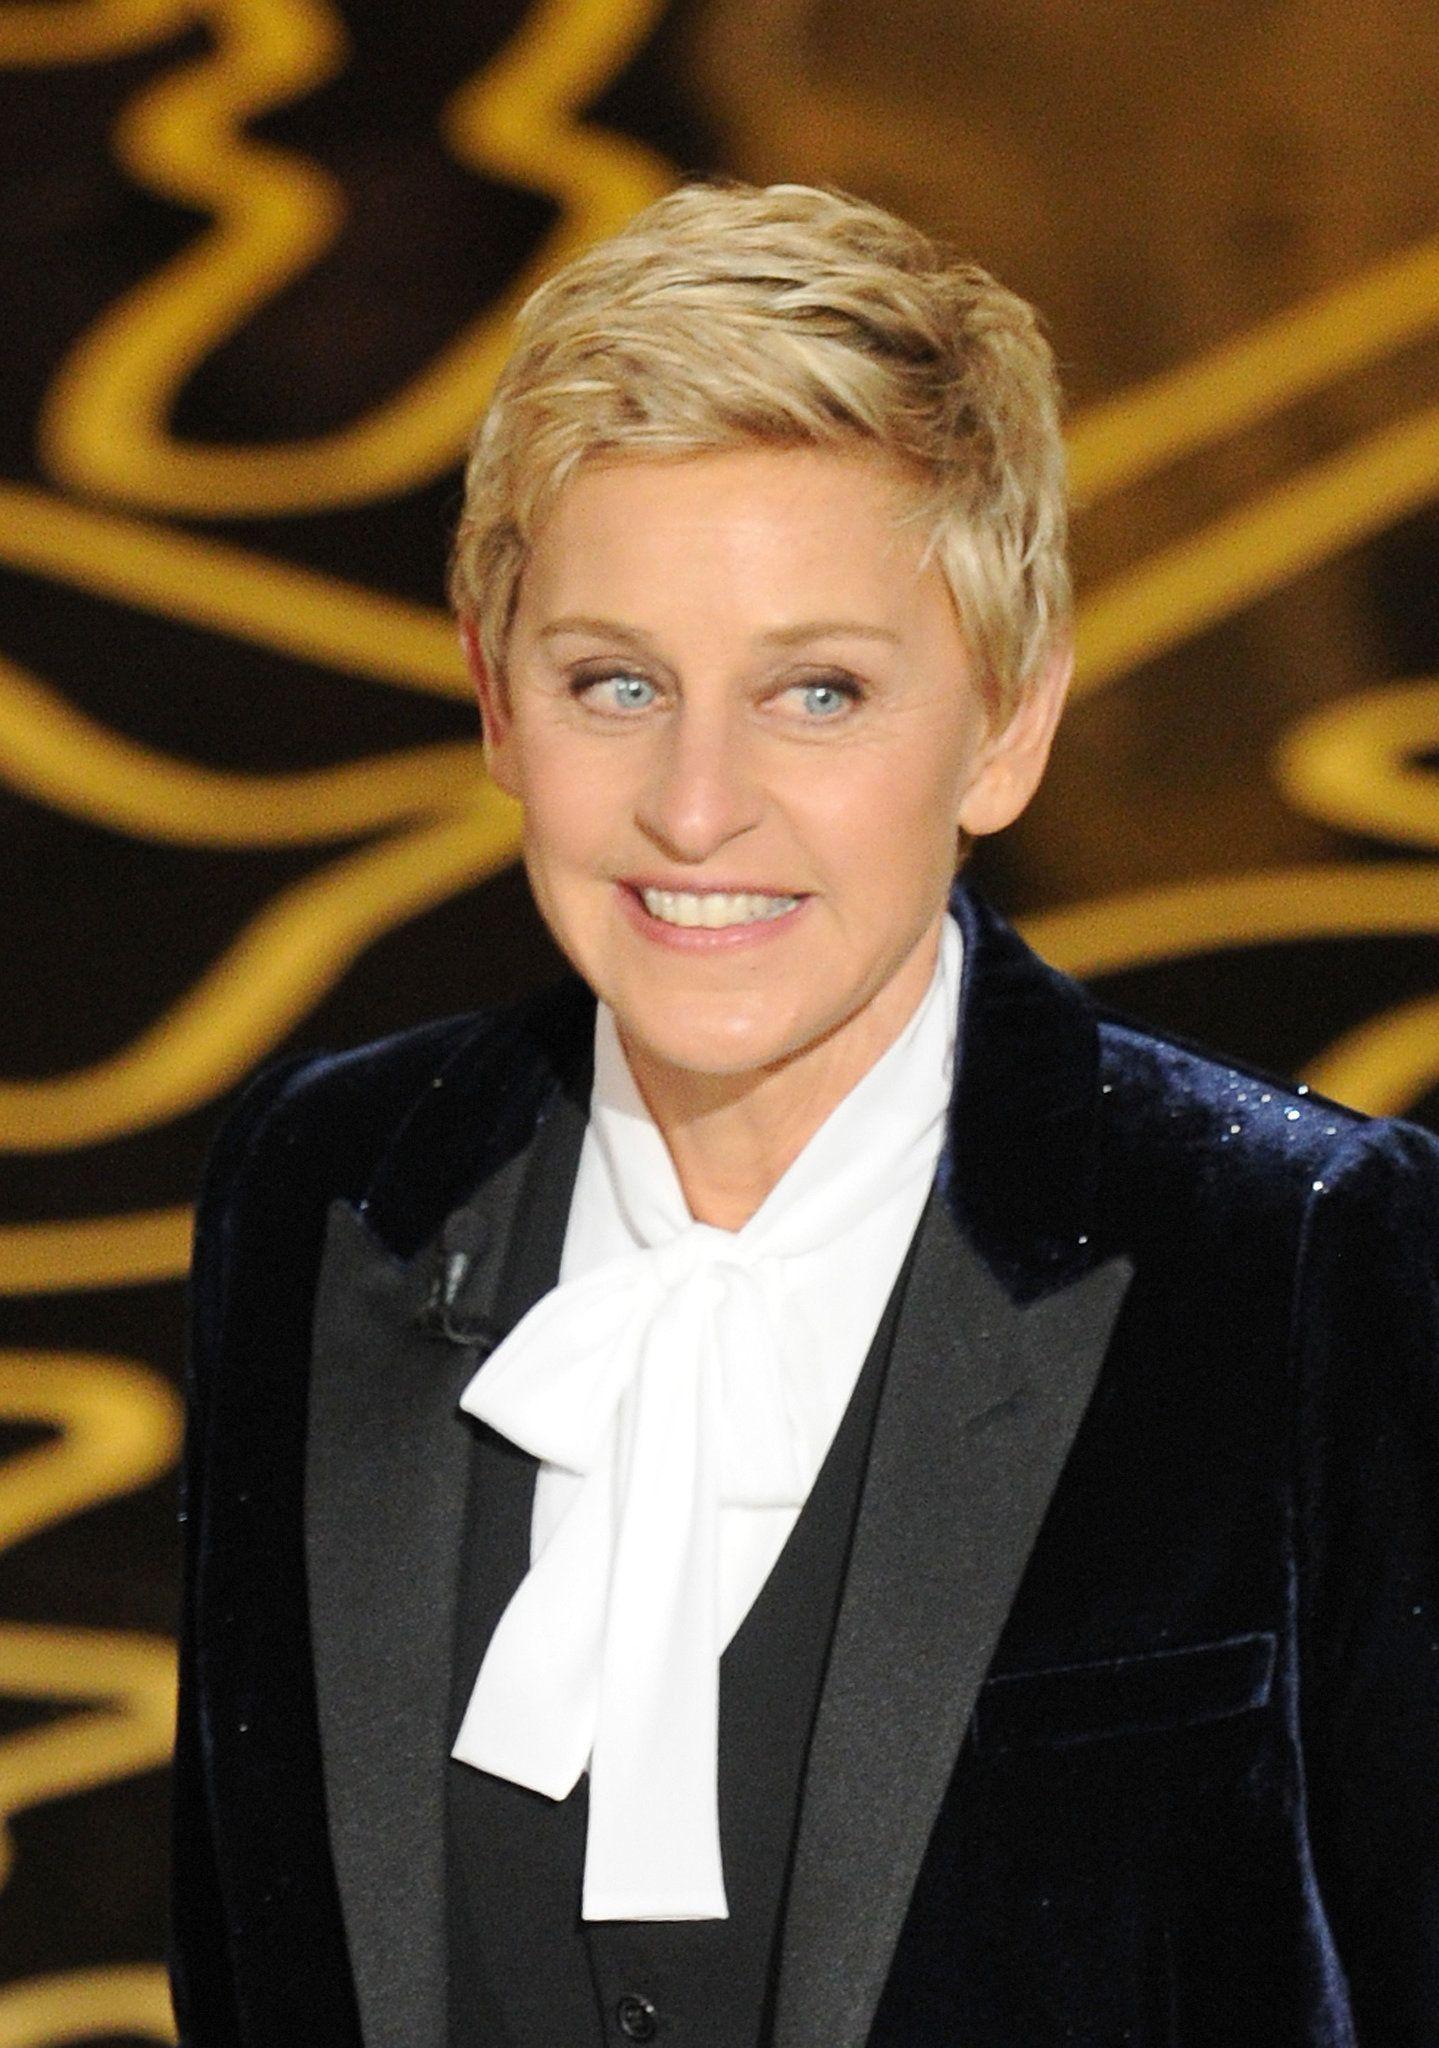 Watch How to Get an Ellen Degeneres Haircut video